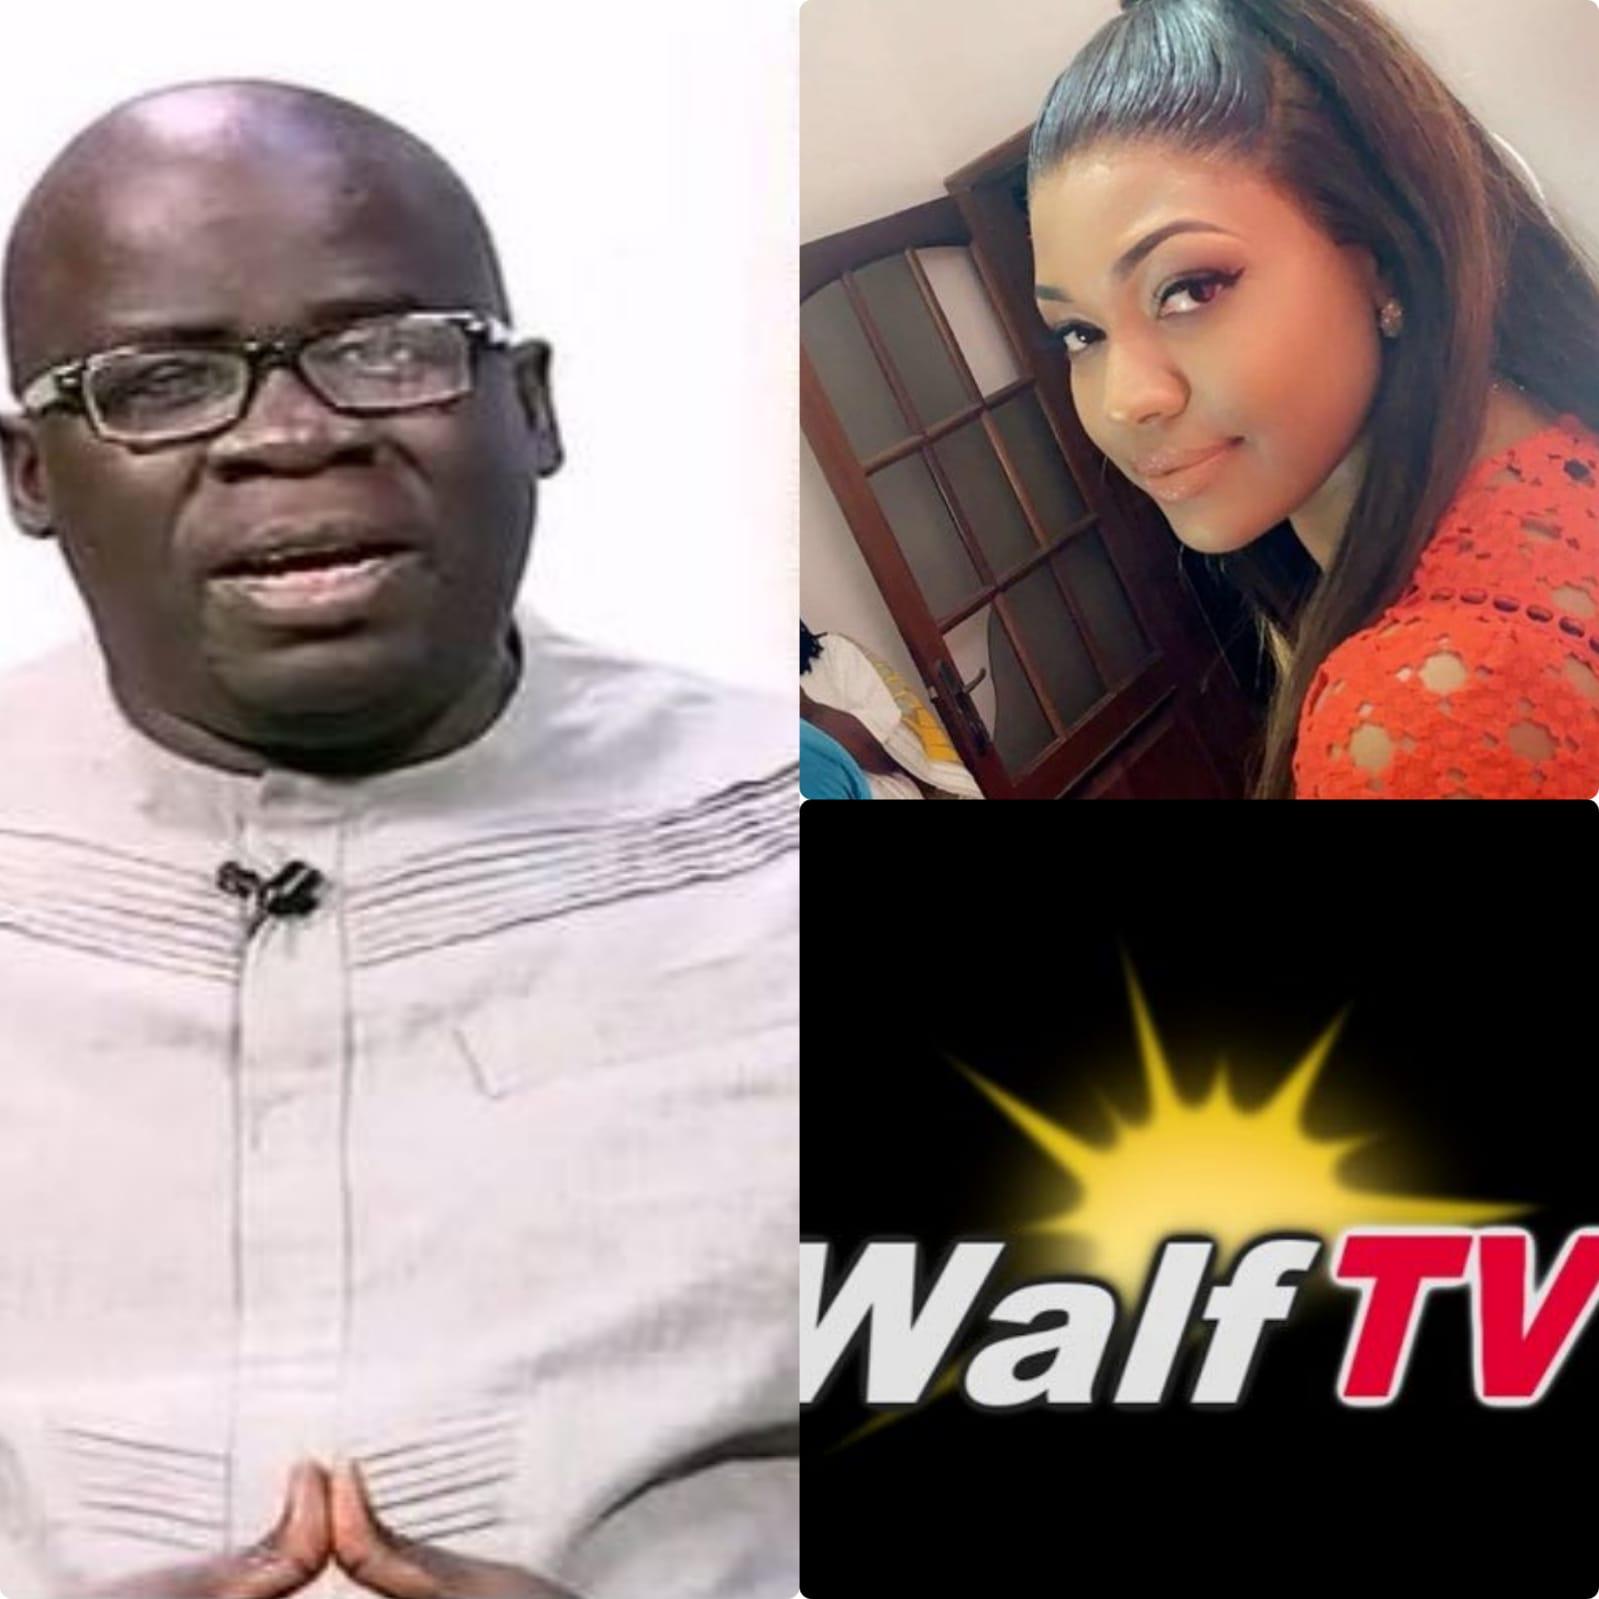 VIDÉO: Aprés la 2STV, Sa Ndogou de Walf Tv accuse Ya Awa de voler l'émission Ziar qu'animait Kabir Séne à Waff